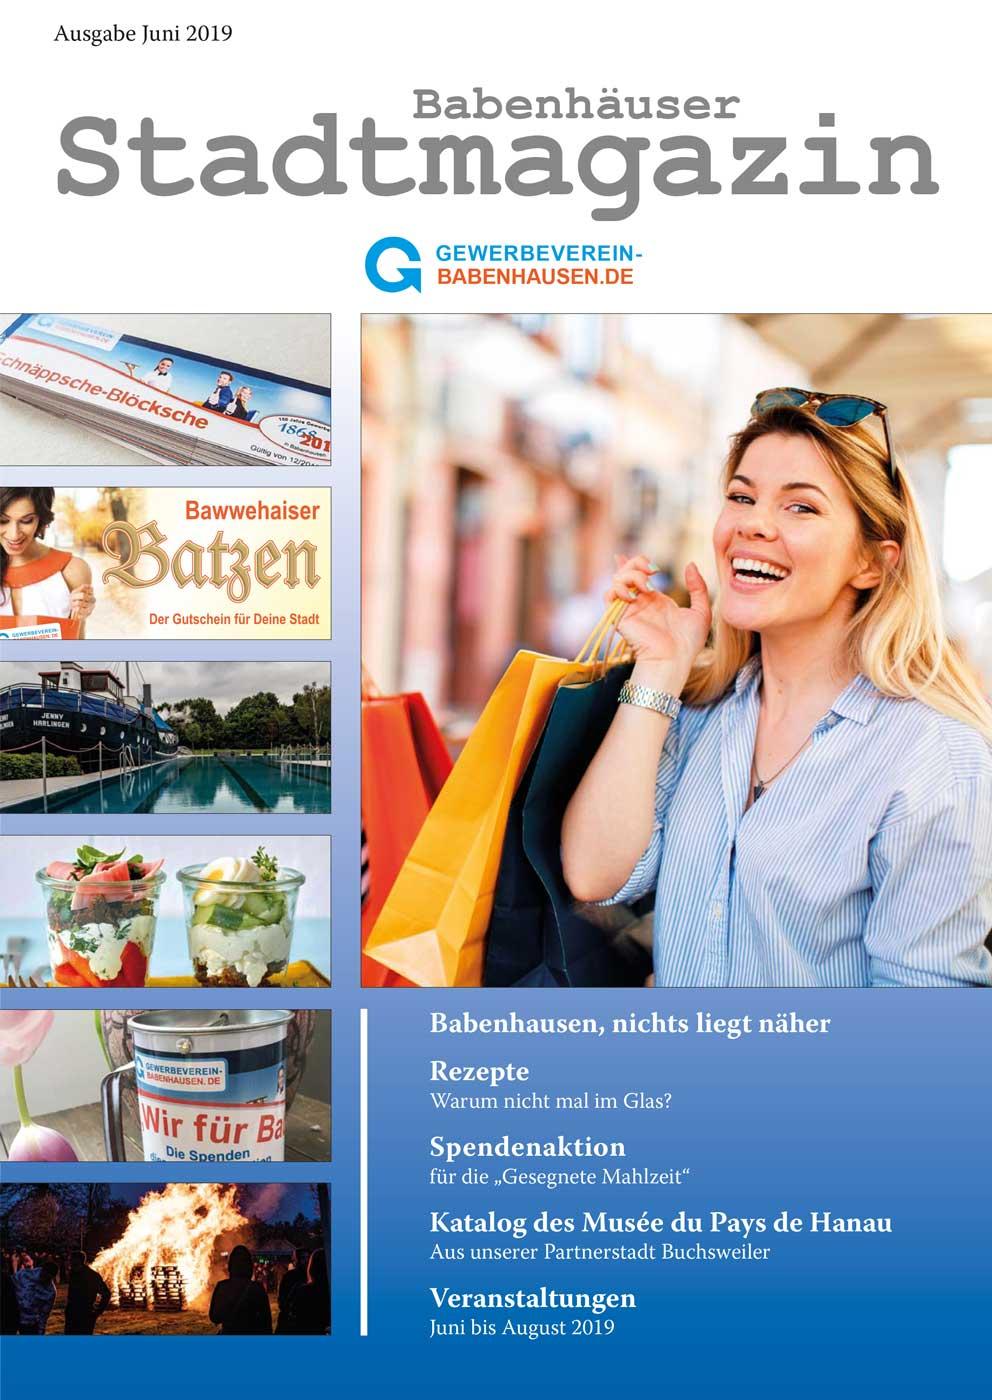 Babenhäuser city magazine June 2/2019